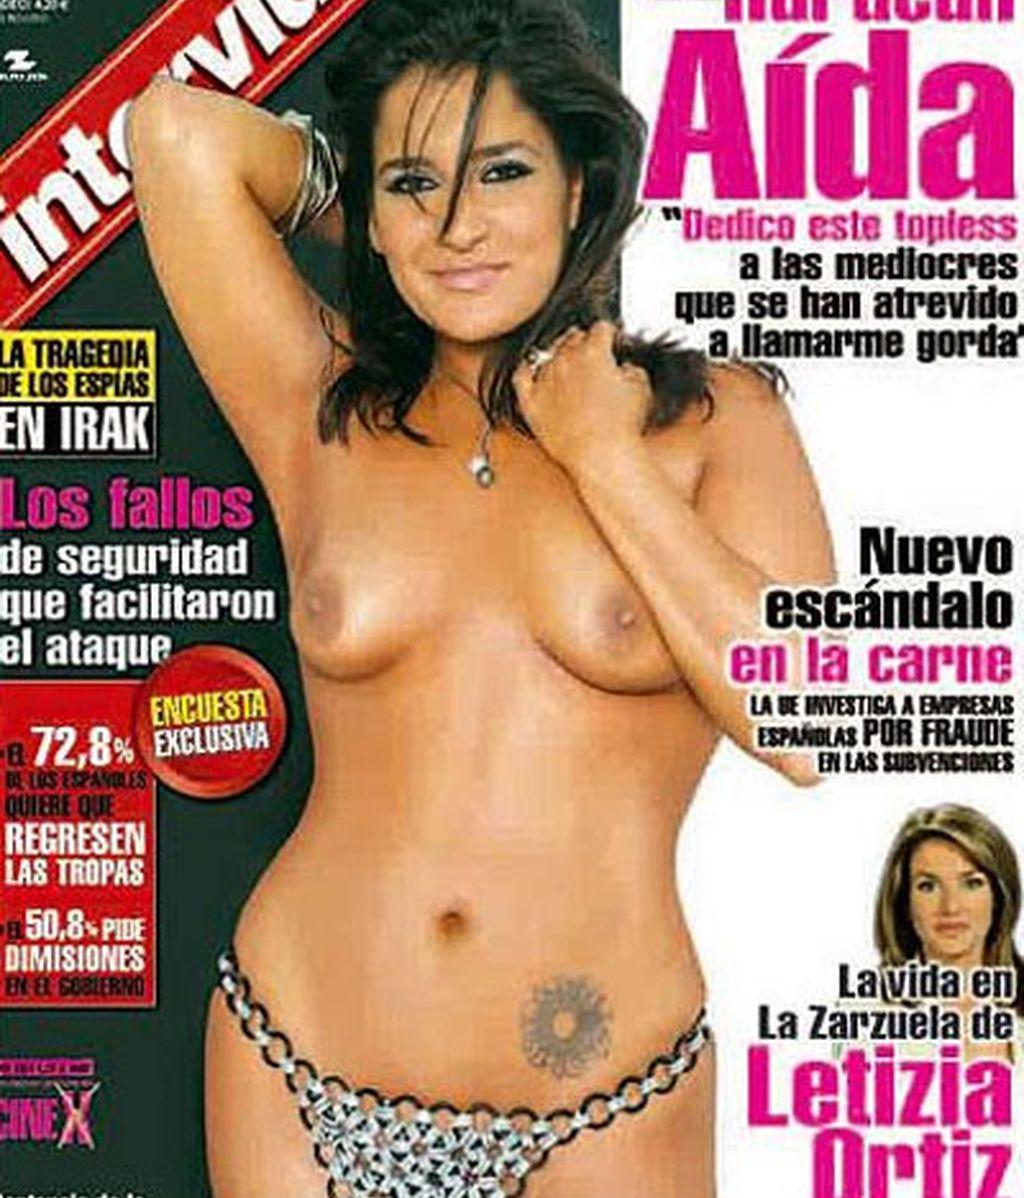 Aida Nizar Desnuda aída nízar se desnuda en interviú